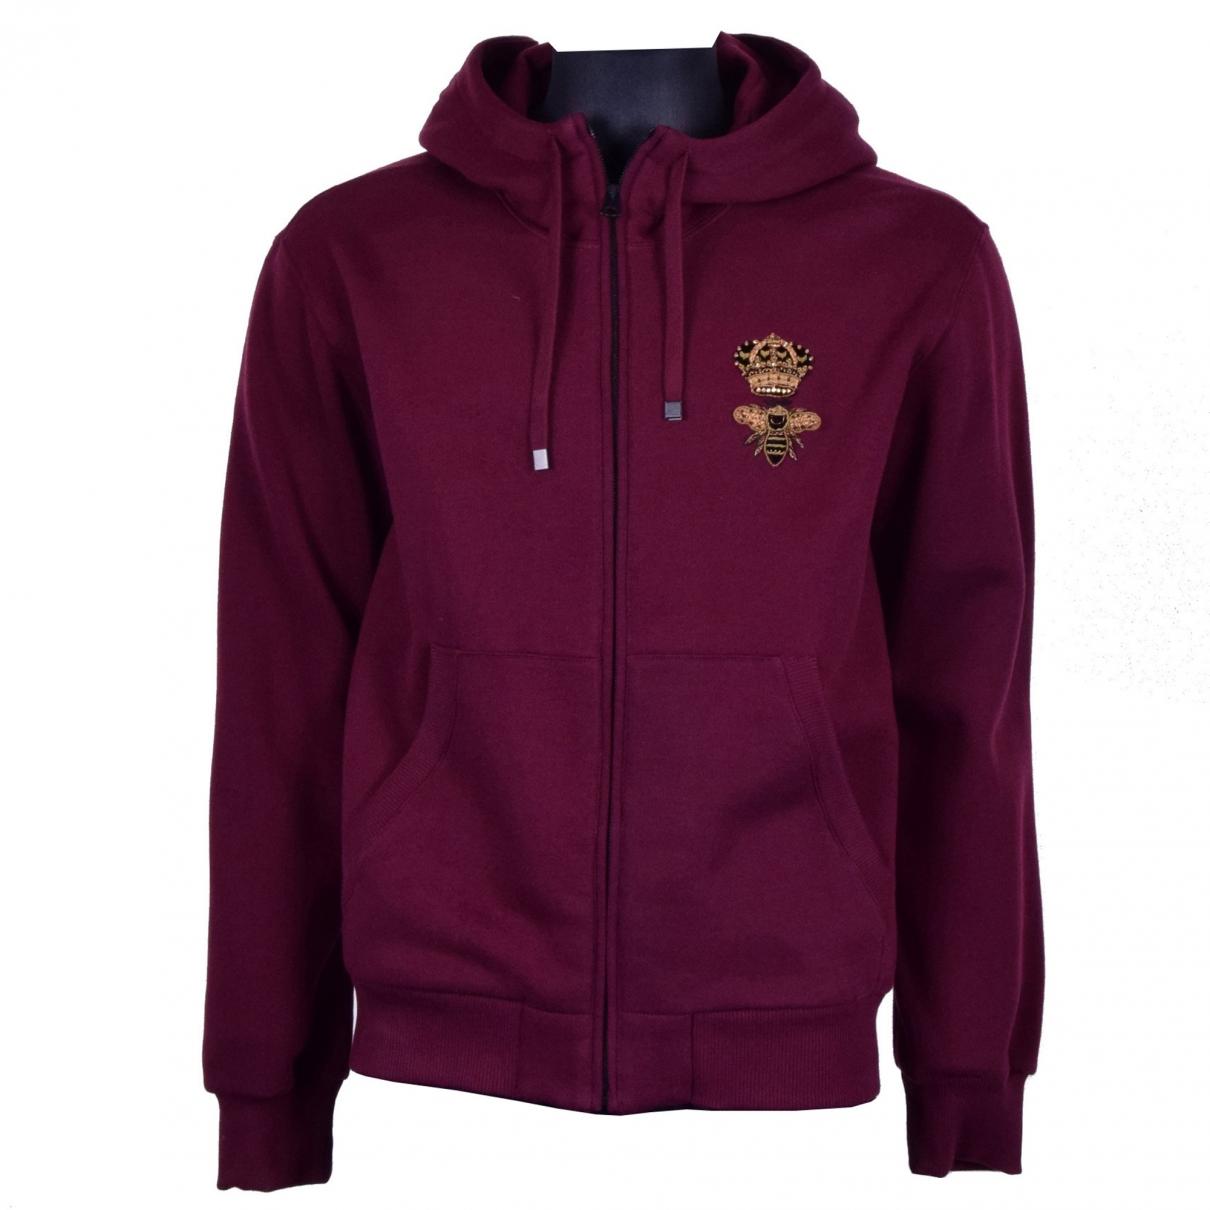 Dolce & Gabbana \N Burgundy Cotton Knitwear & Sweatshirts for Men 52 IT